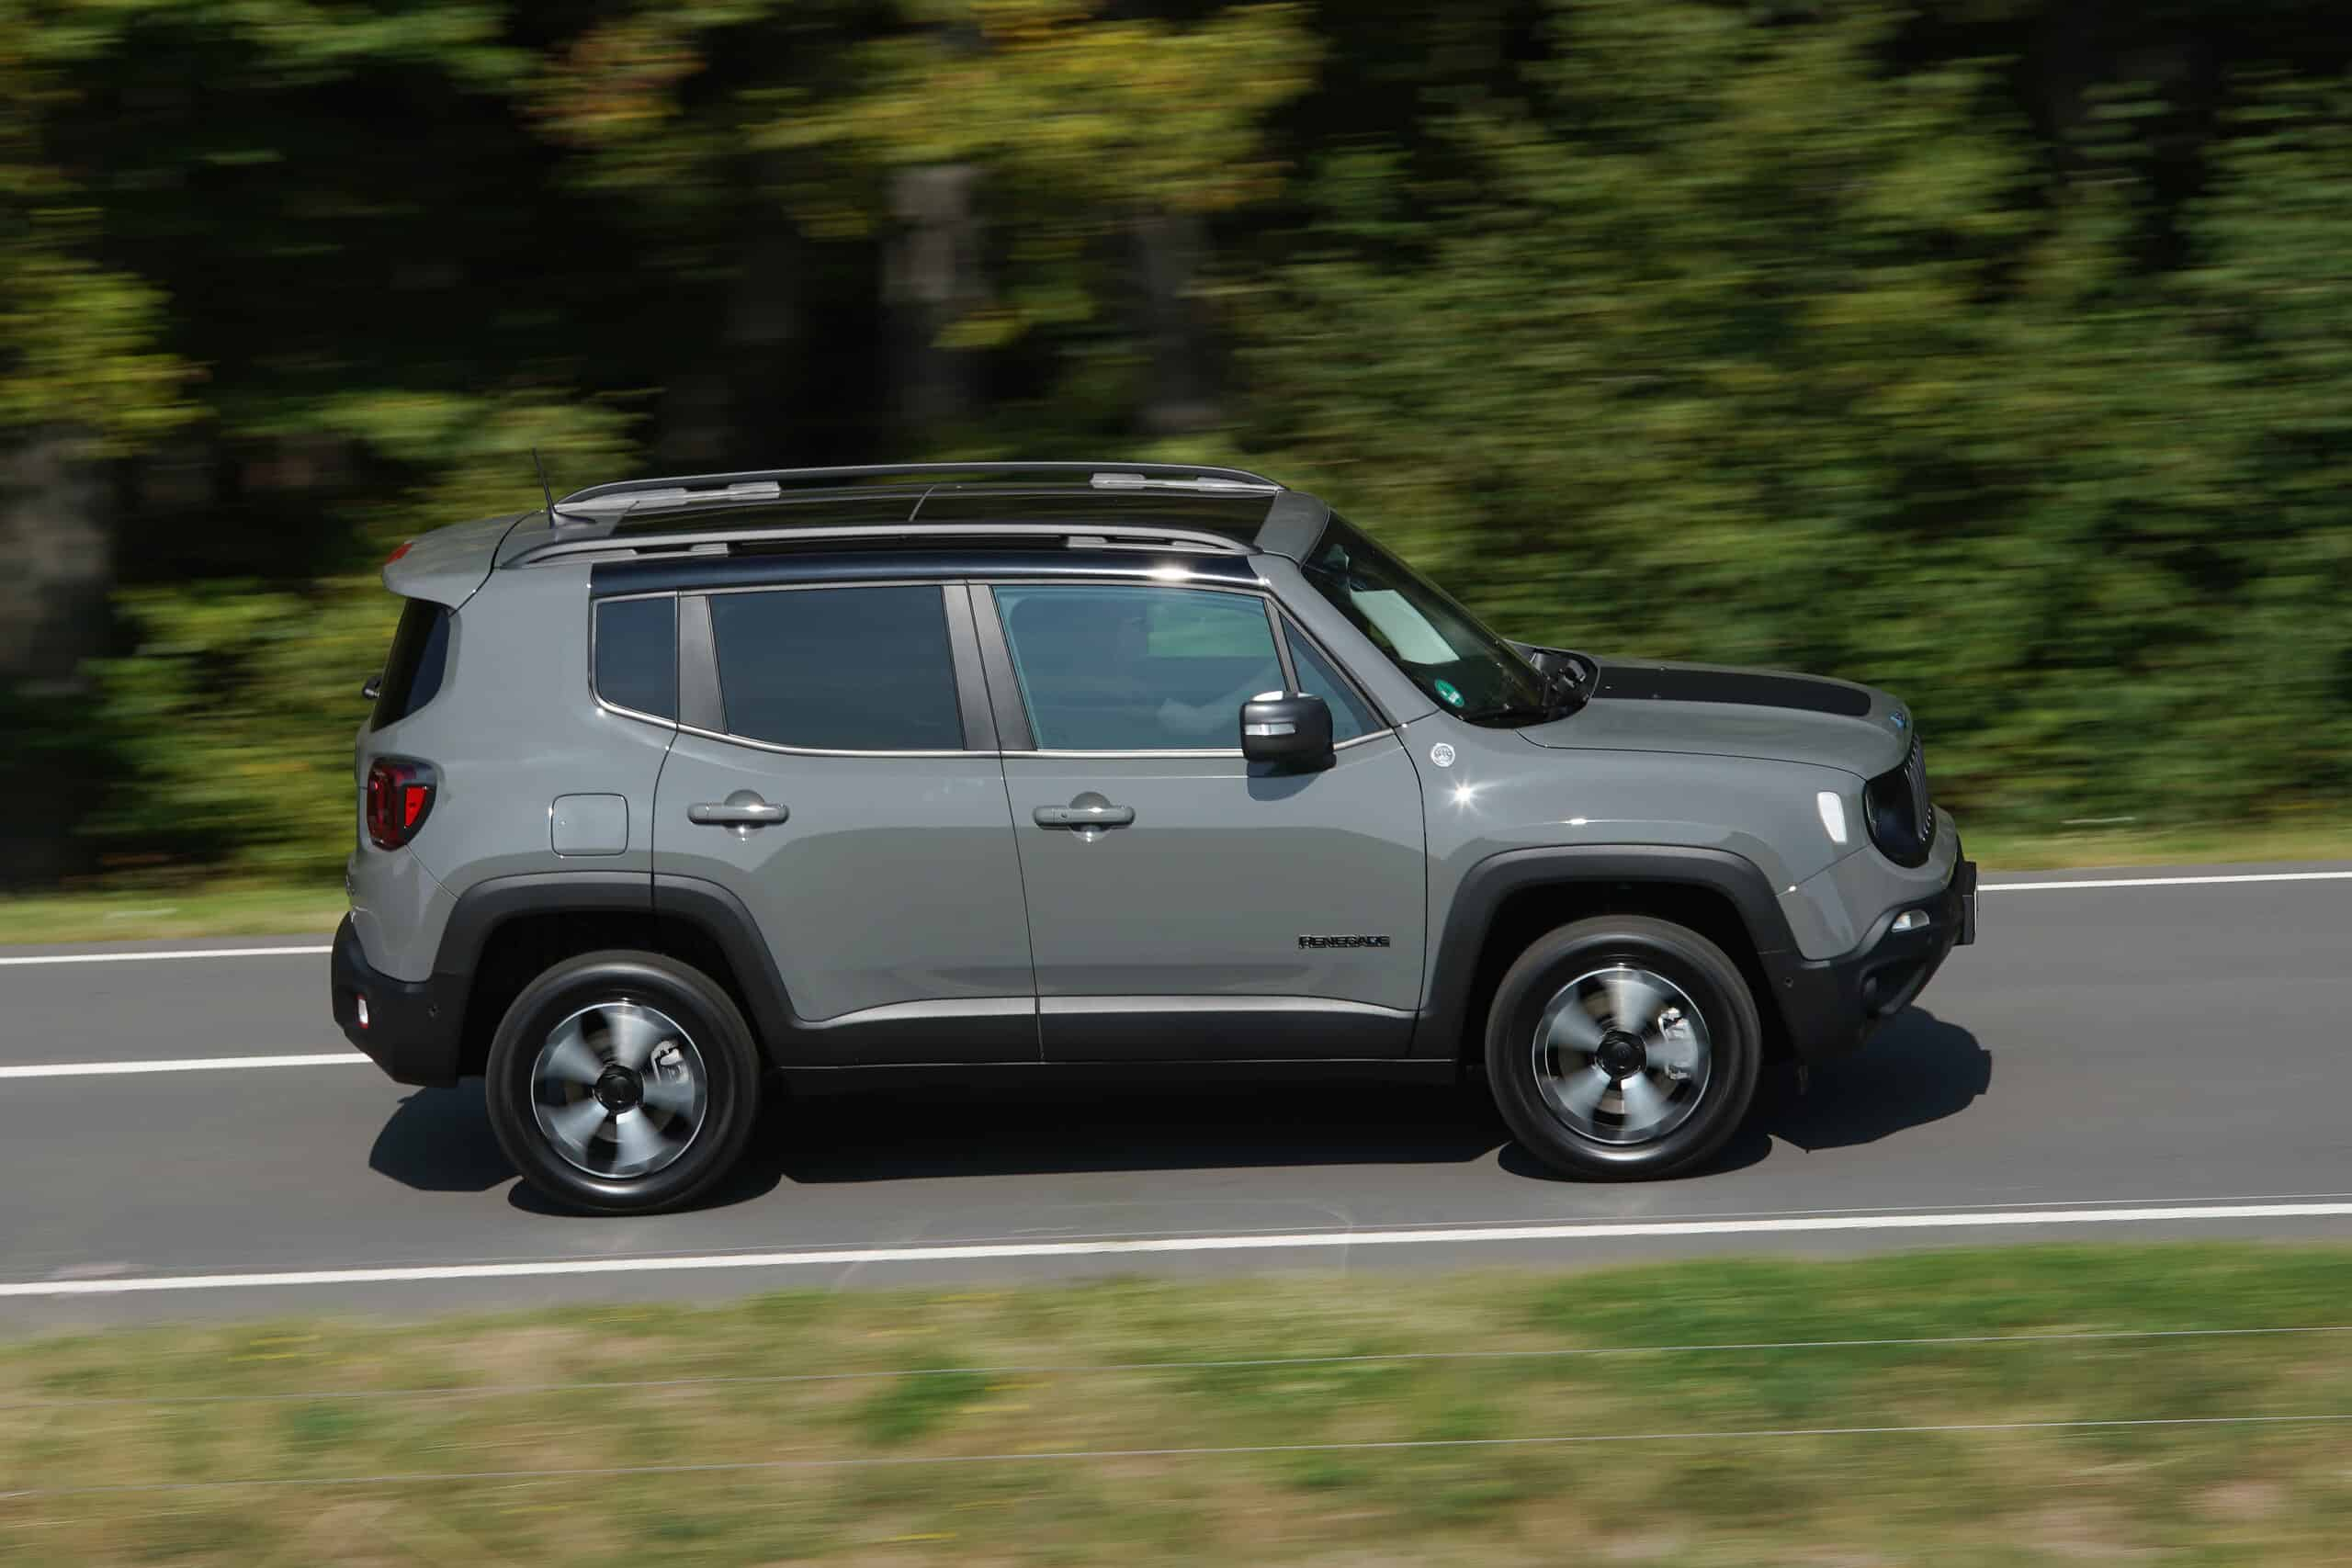 2020 Jeep Renegade 4xe (240 PS) - Das kann der Plug-in Hybrid!